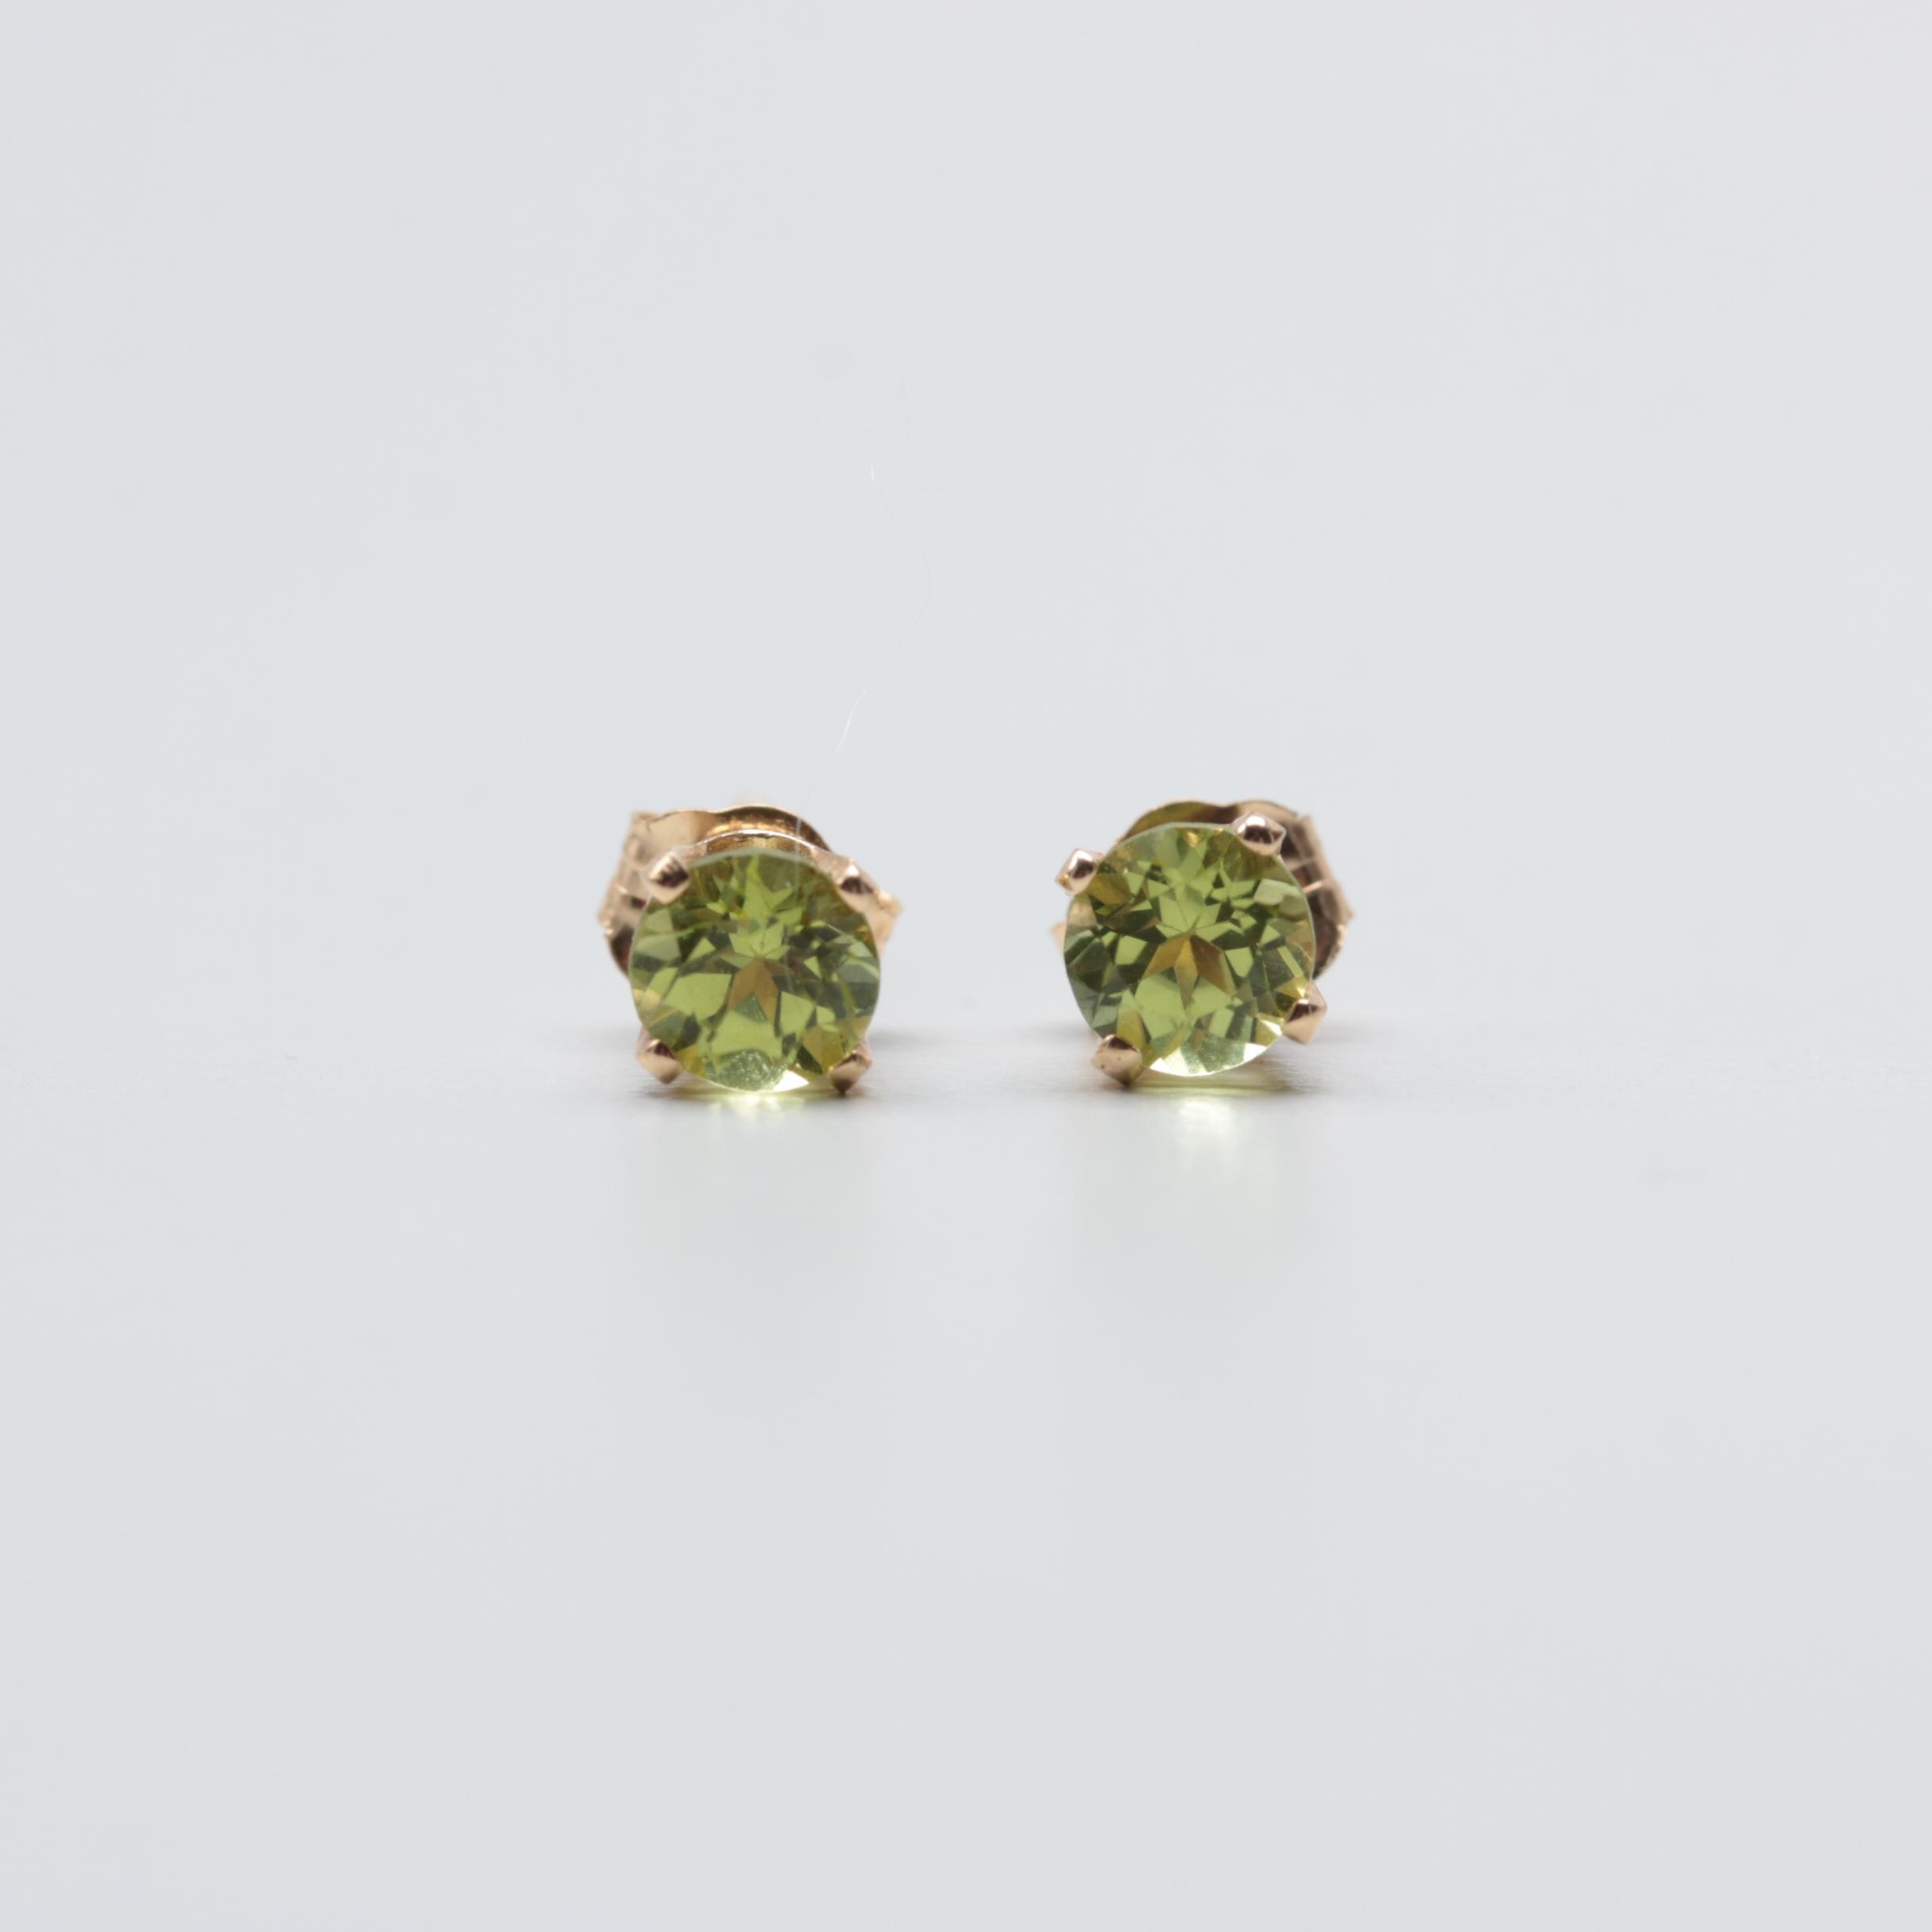 14K Yellow Gold Peridot Stud Earrings